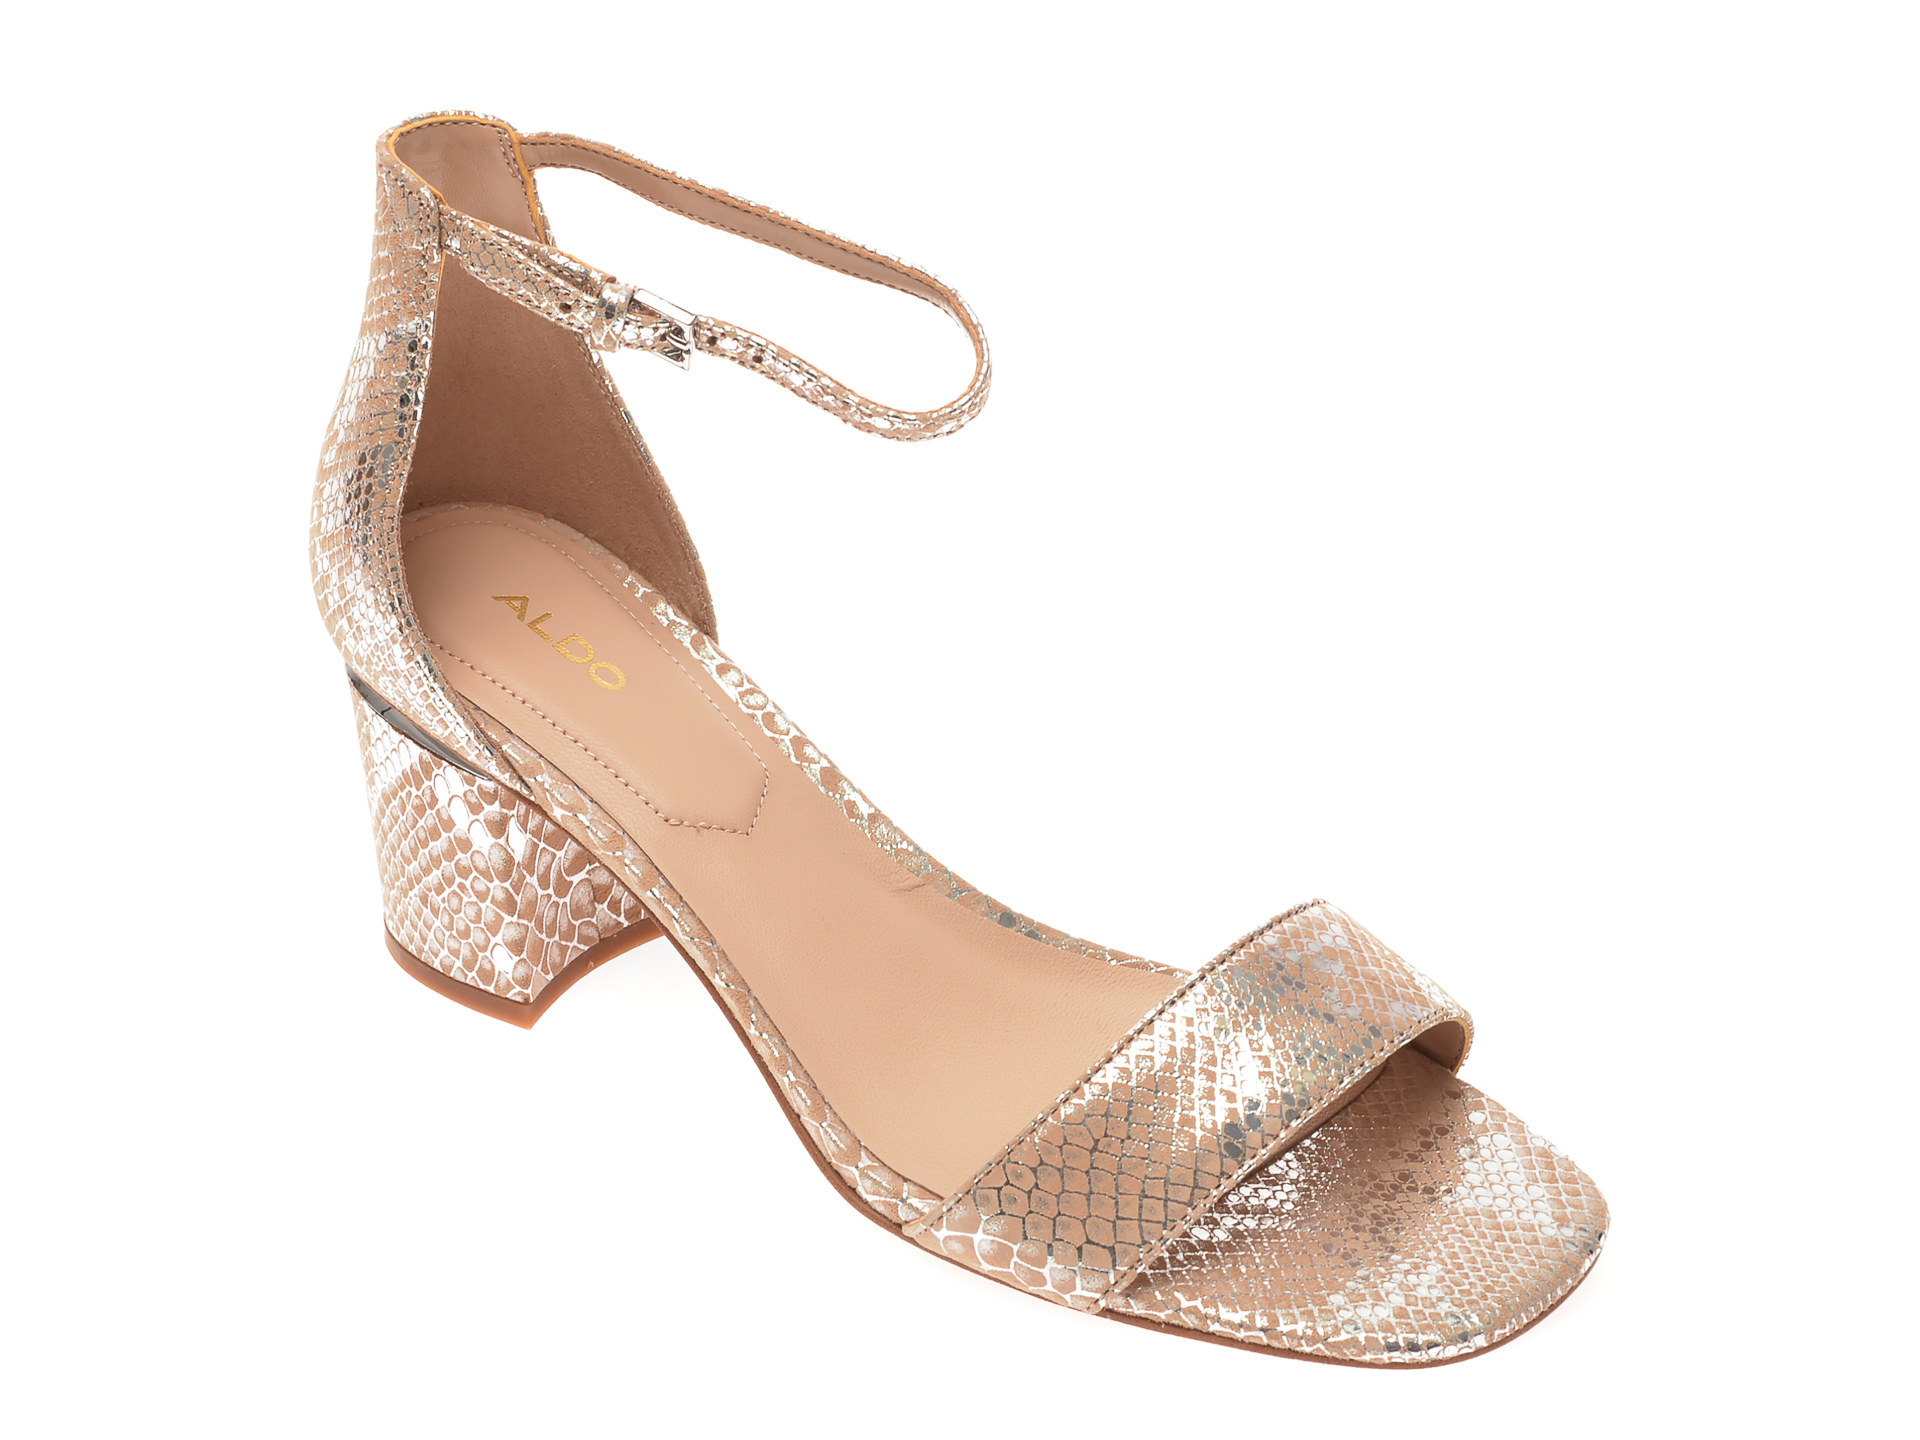 Sandale ALDO aurii, Valentina041, din piele naturala New